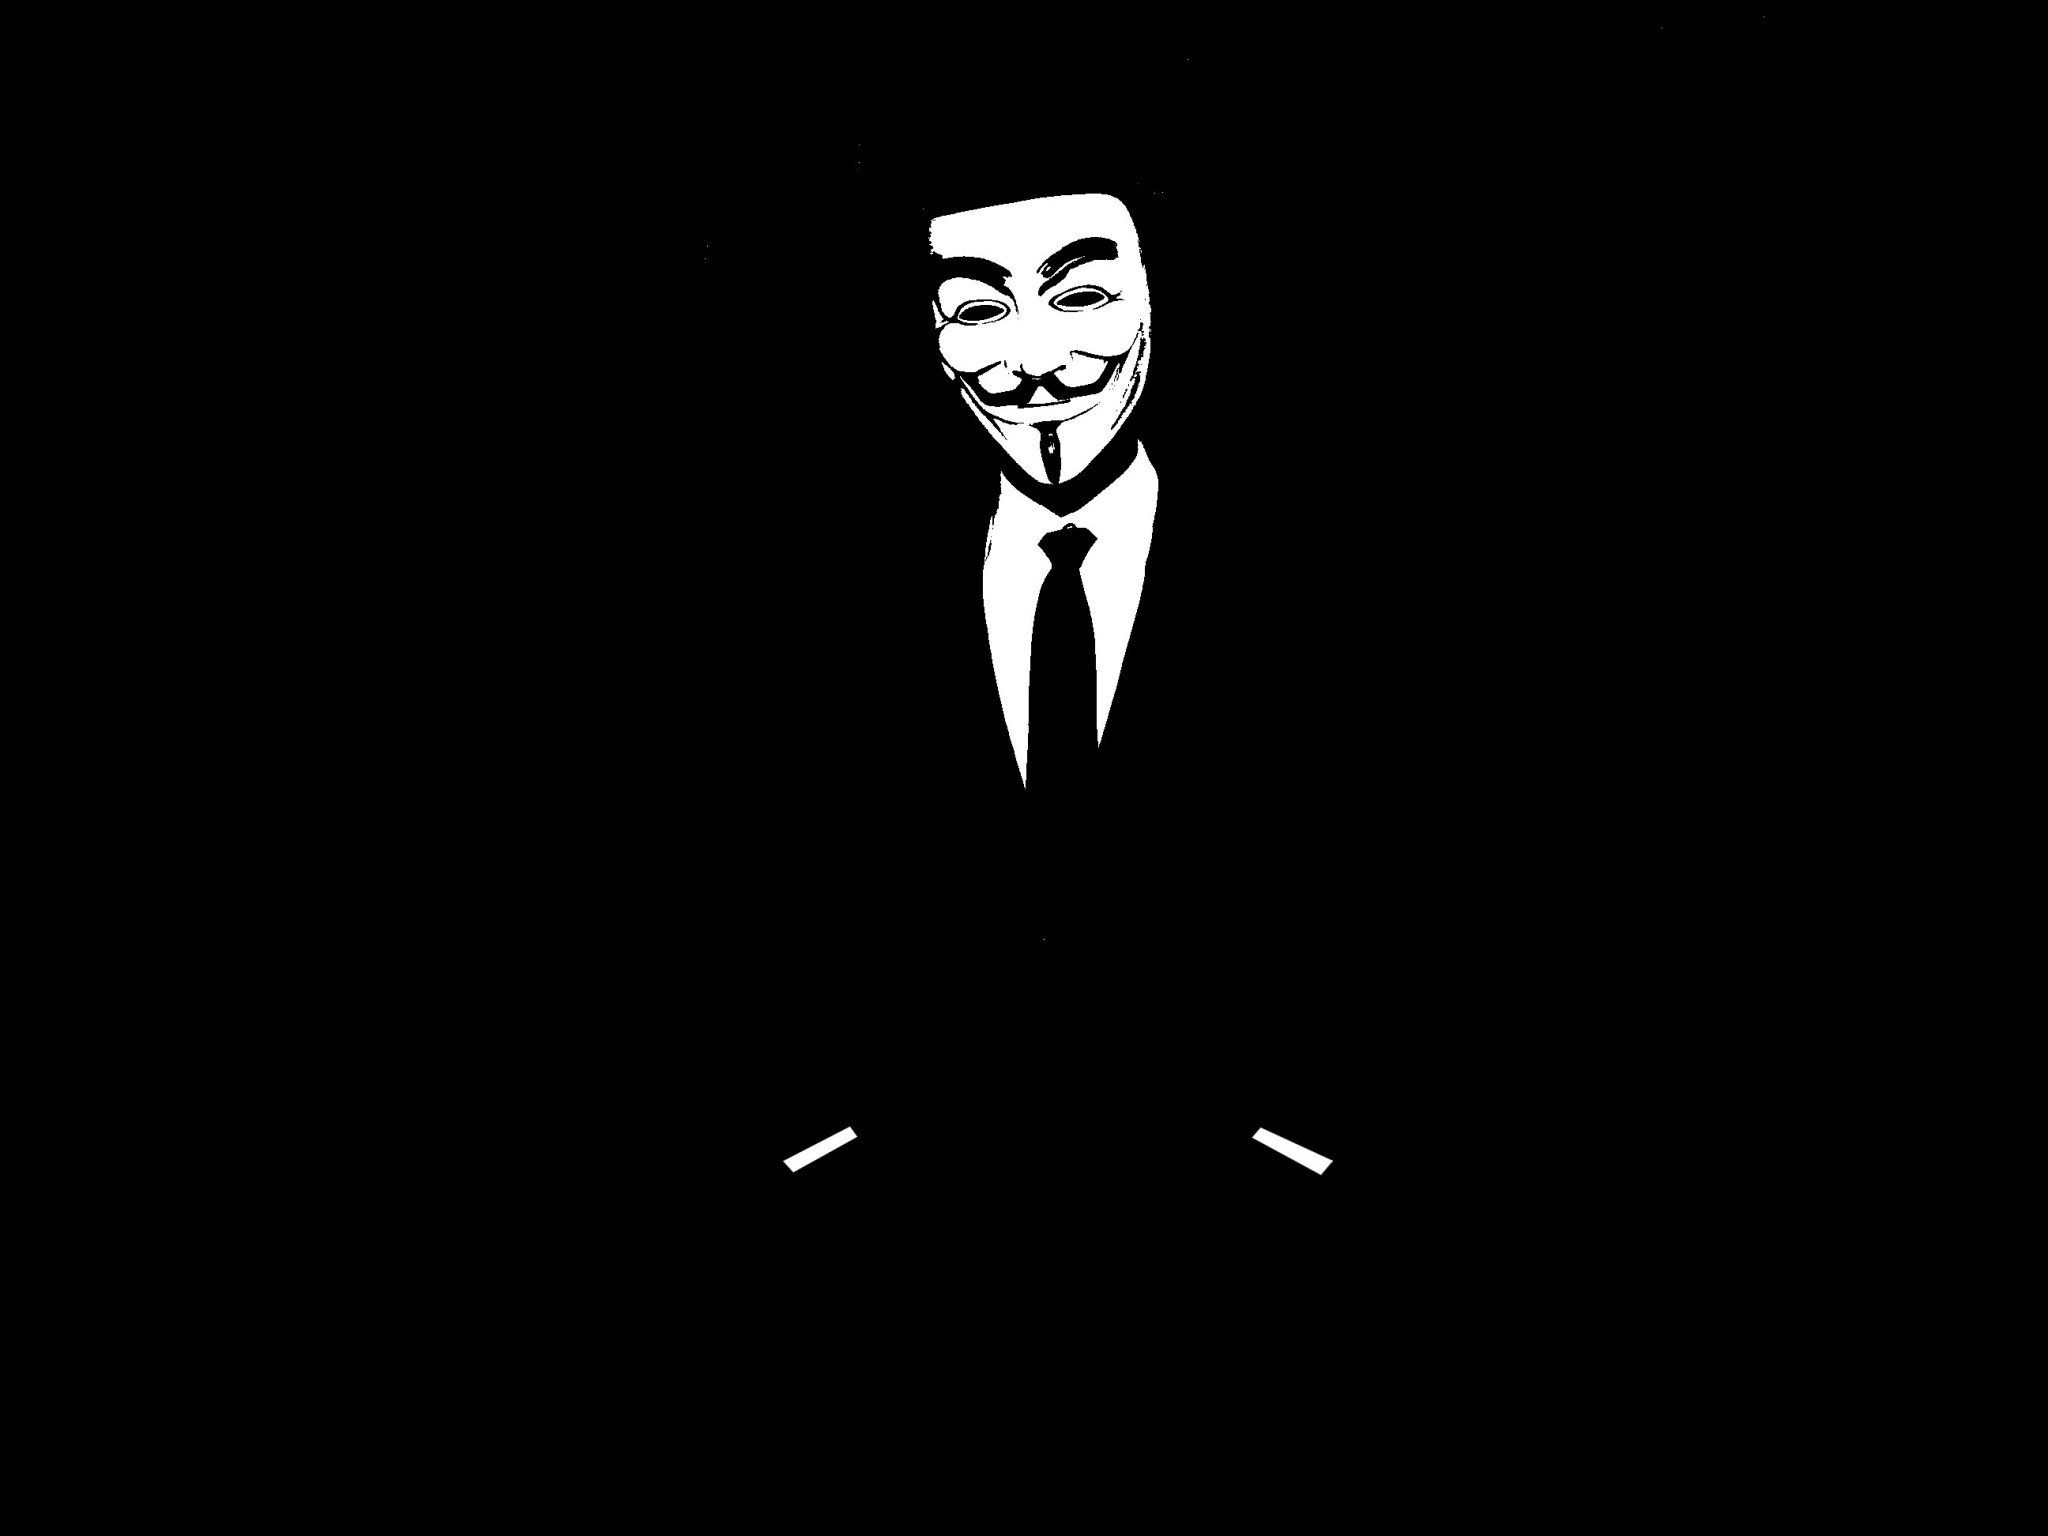 anonymous hd widescreen wallpapers for desktop